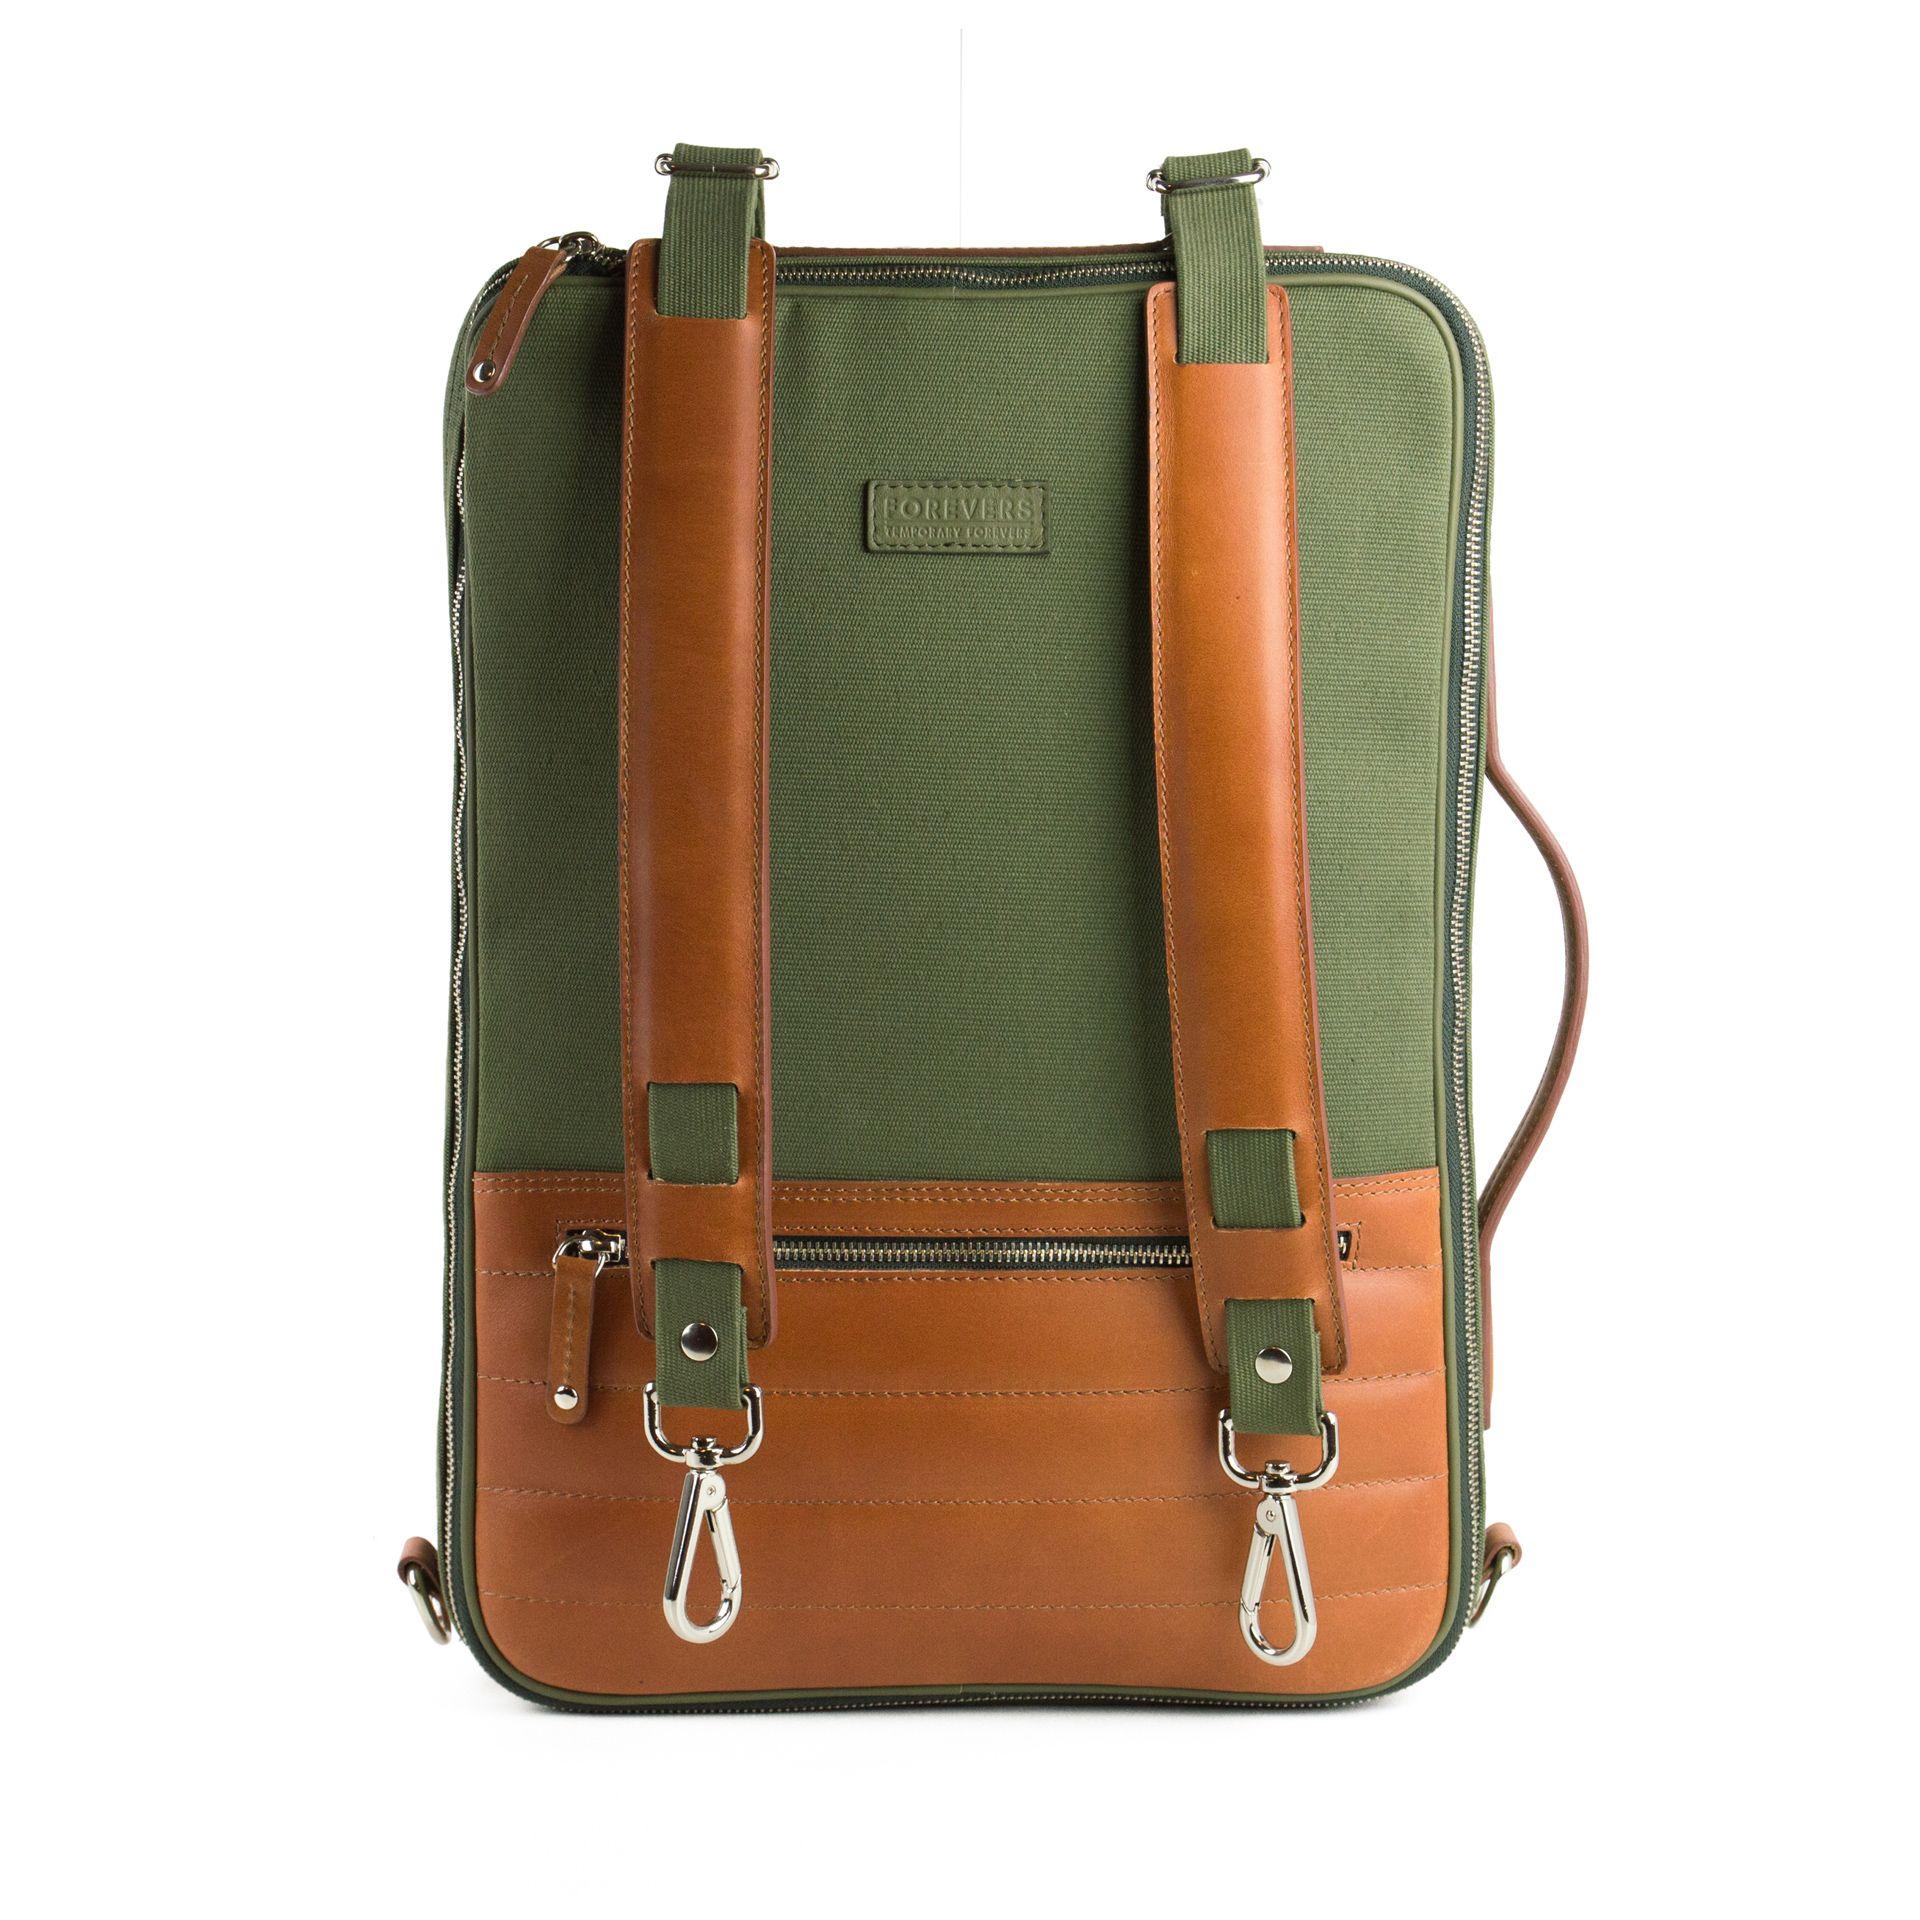 Chenjunyi Mandalorian Drawstring Backpack Foldable Gym Tote Dance Bag for Swimming Shopping Sports Women Men Boys Girls